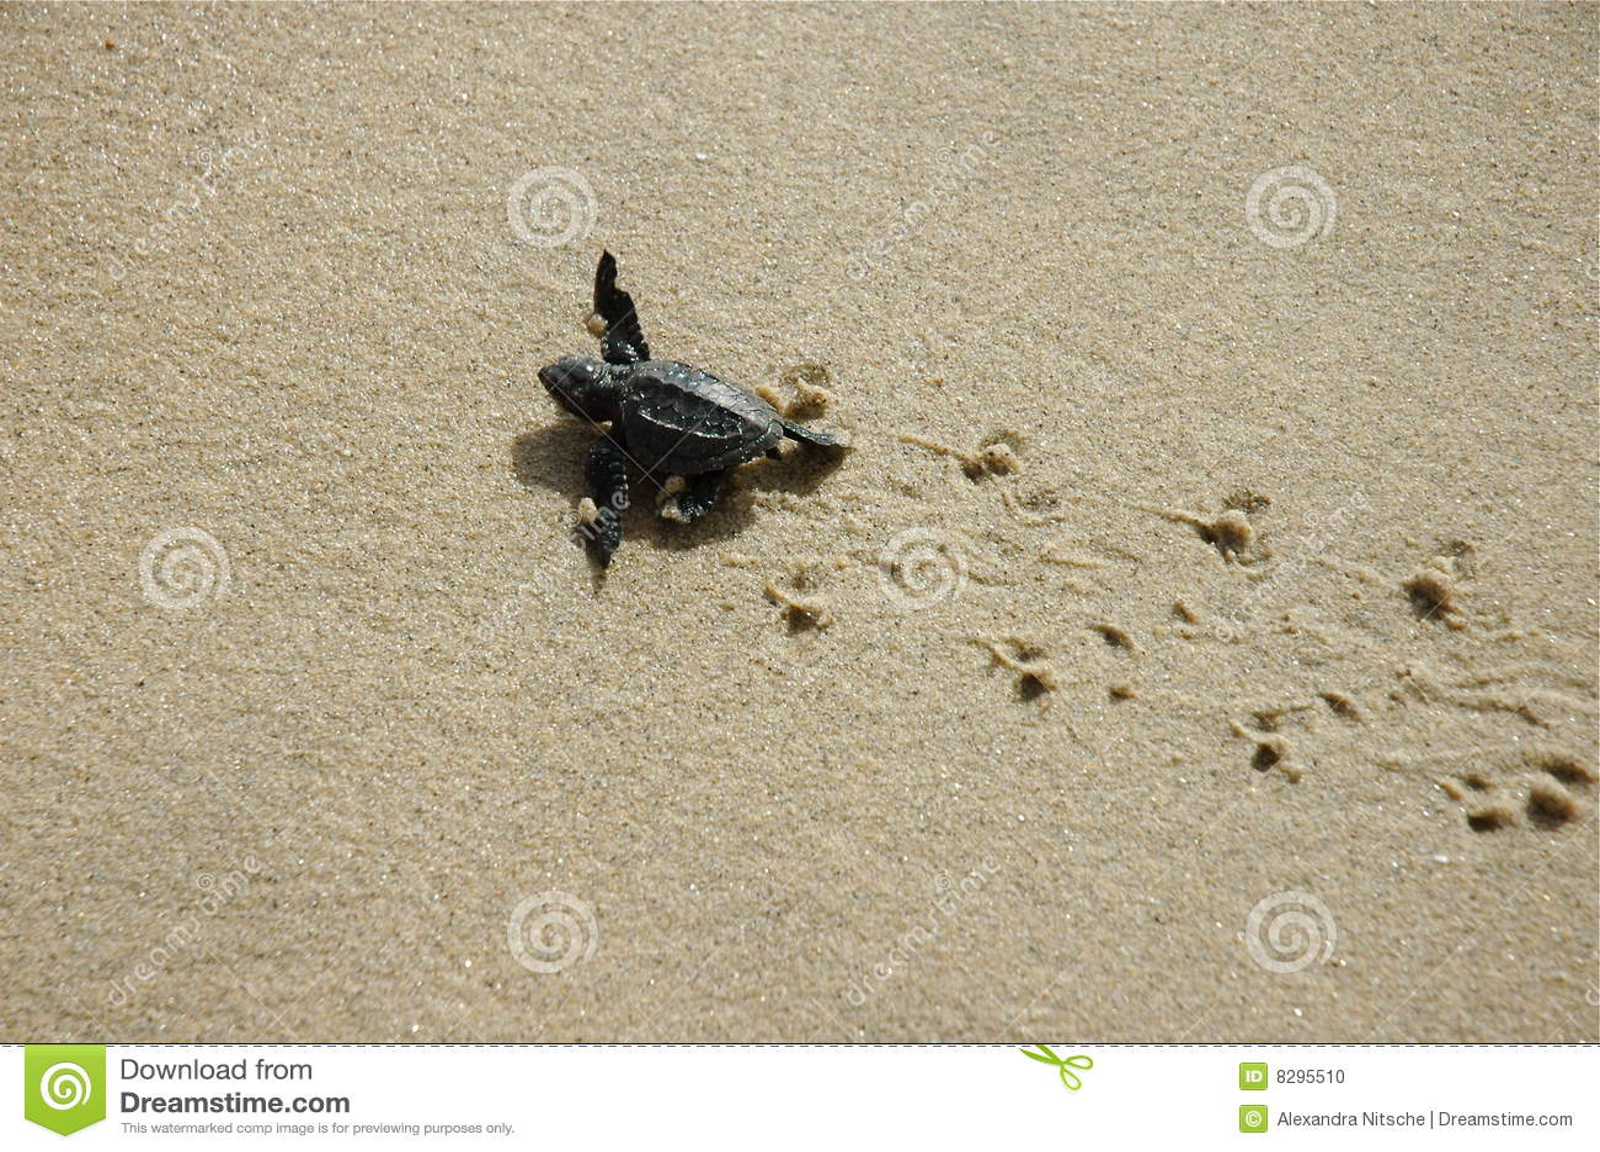 how to break up wet sand